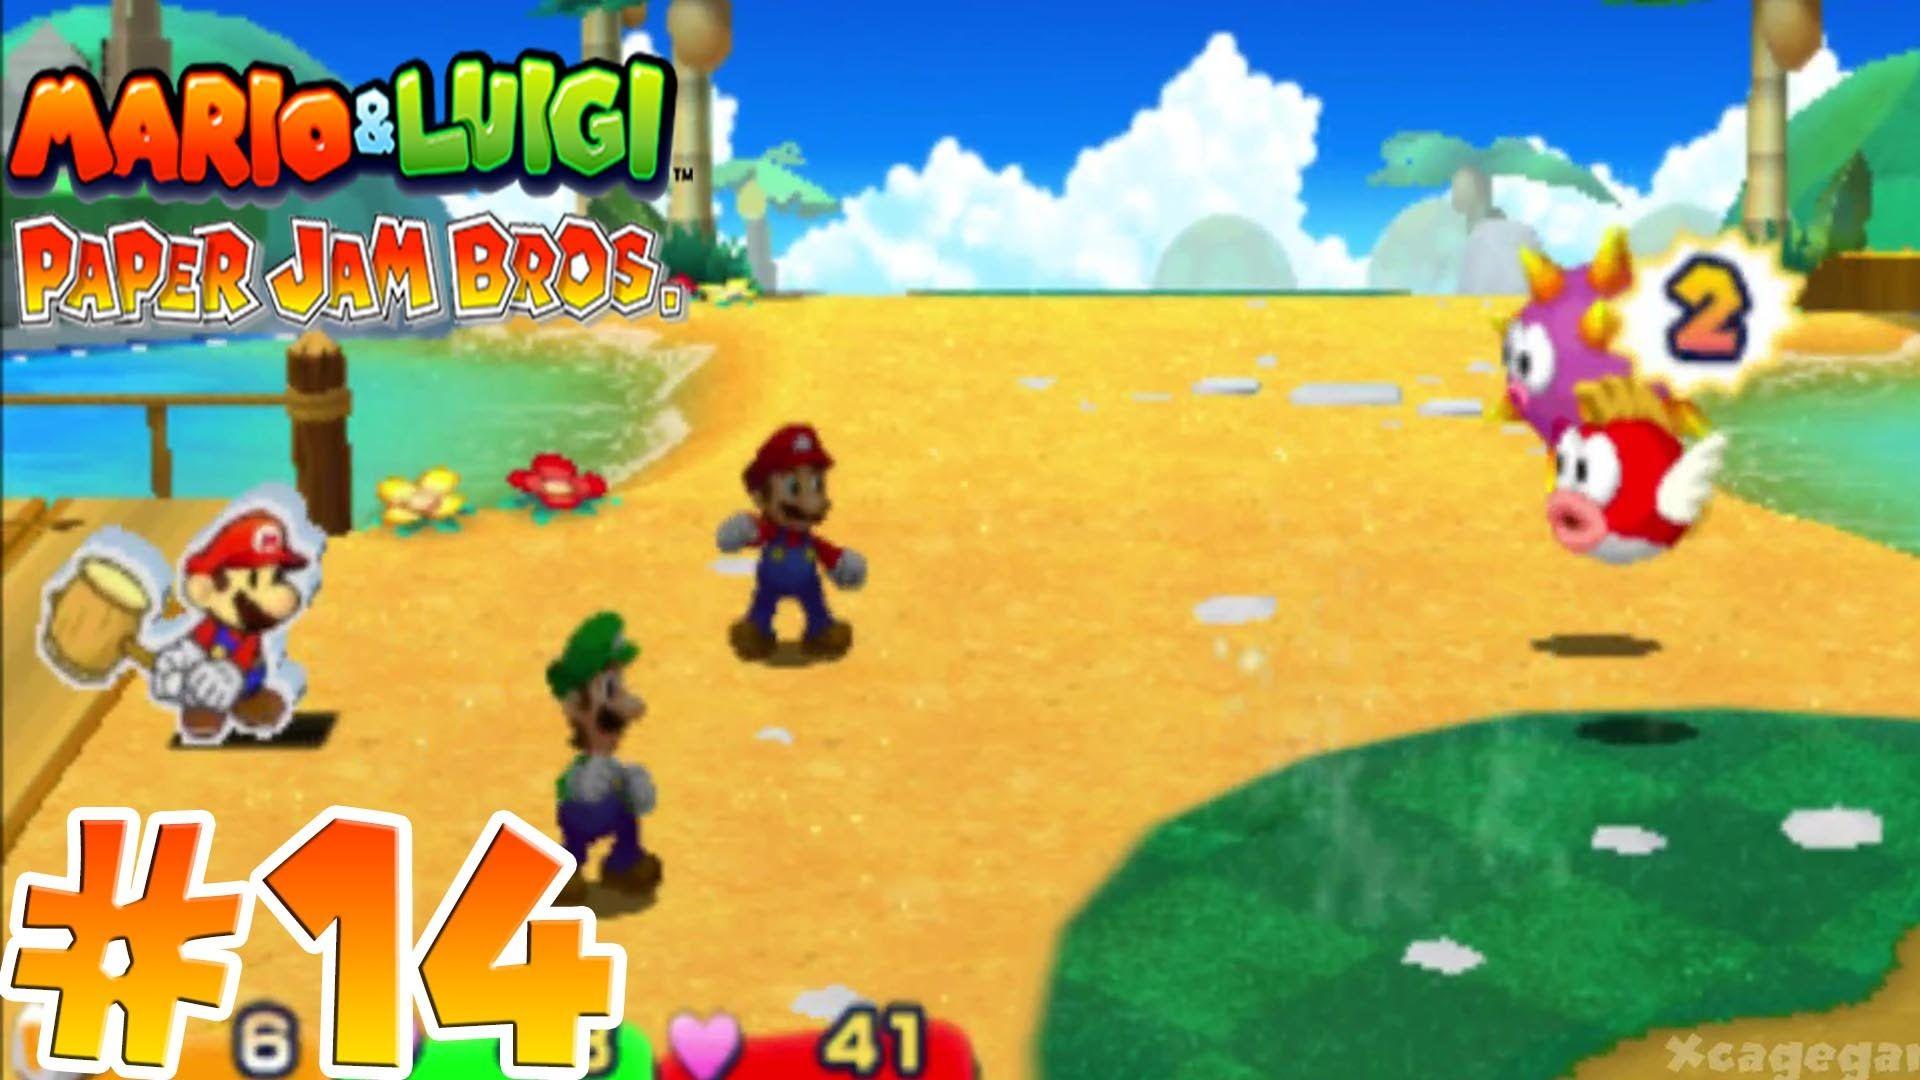 Mario & Luigi Paper Jam Bros. - Gameplay Walkthrough Part 14 - [ HD ]